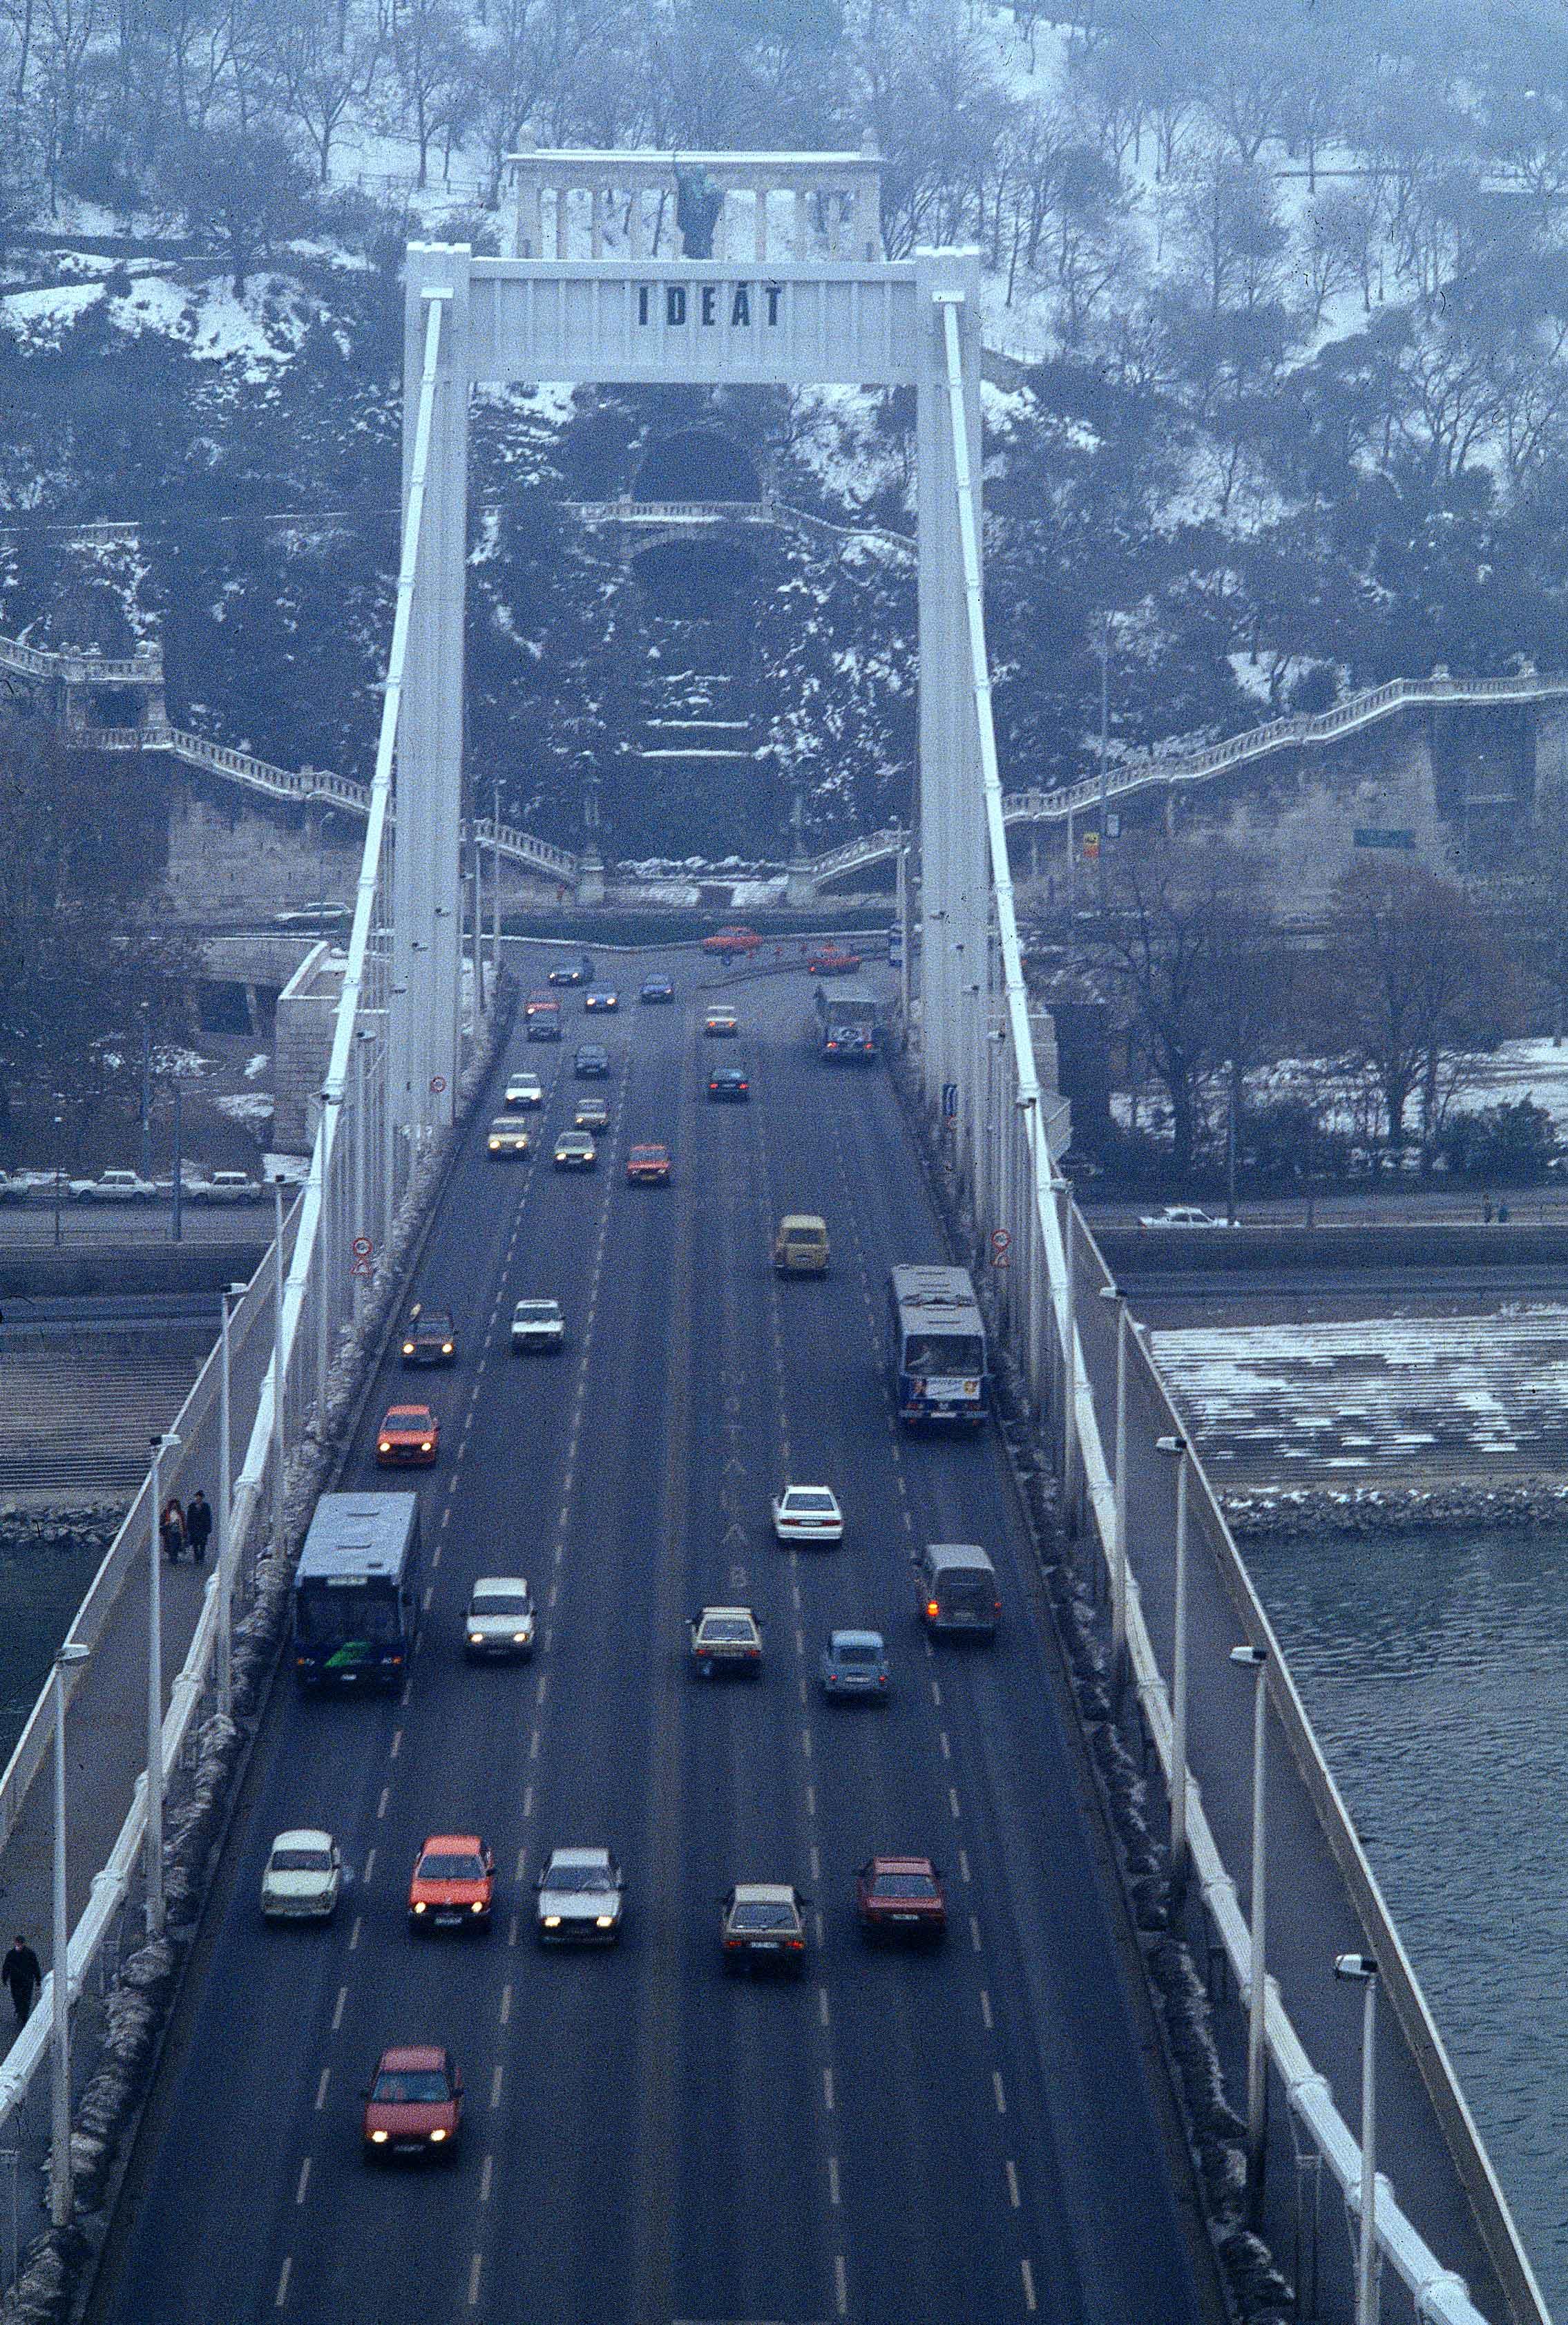 Directions Signs 1993. Elisabeth Bridge, Budapest